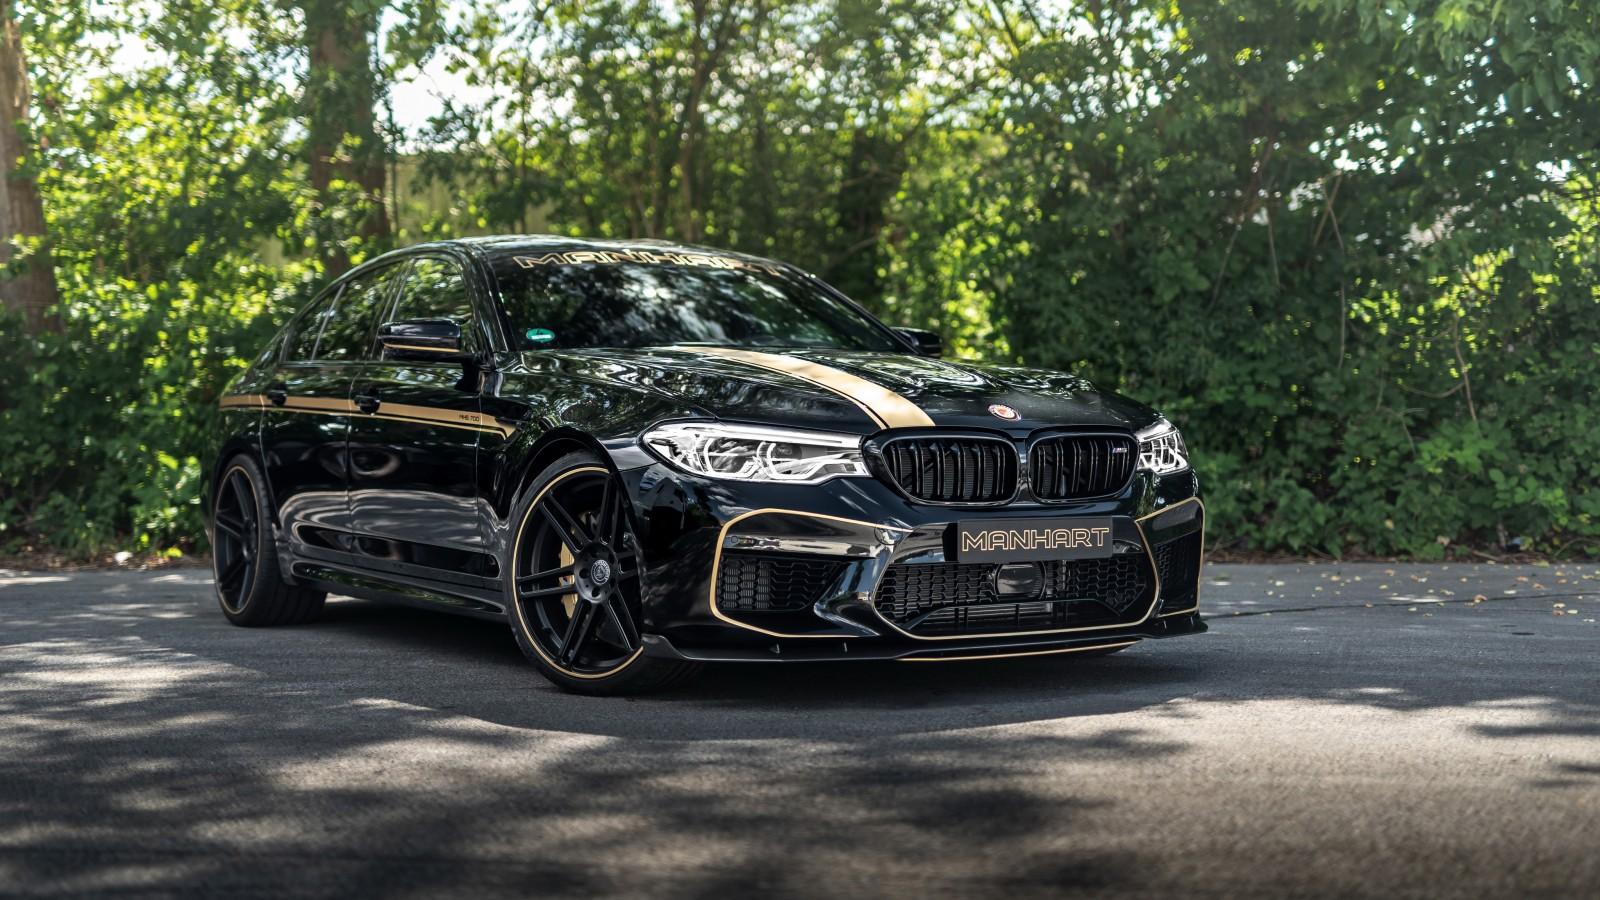 BMW M5 Manhart Racing MH5 700 2018 4K Wallpaper | HD Car ...